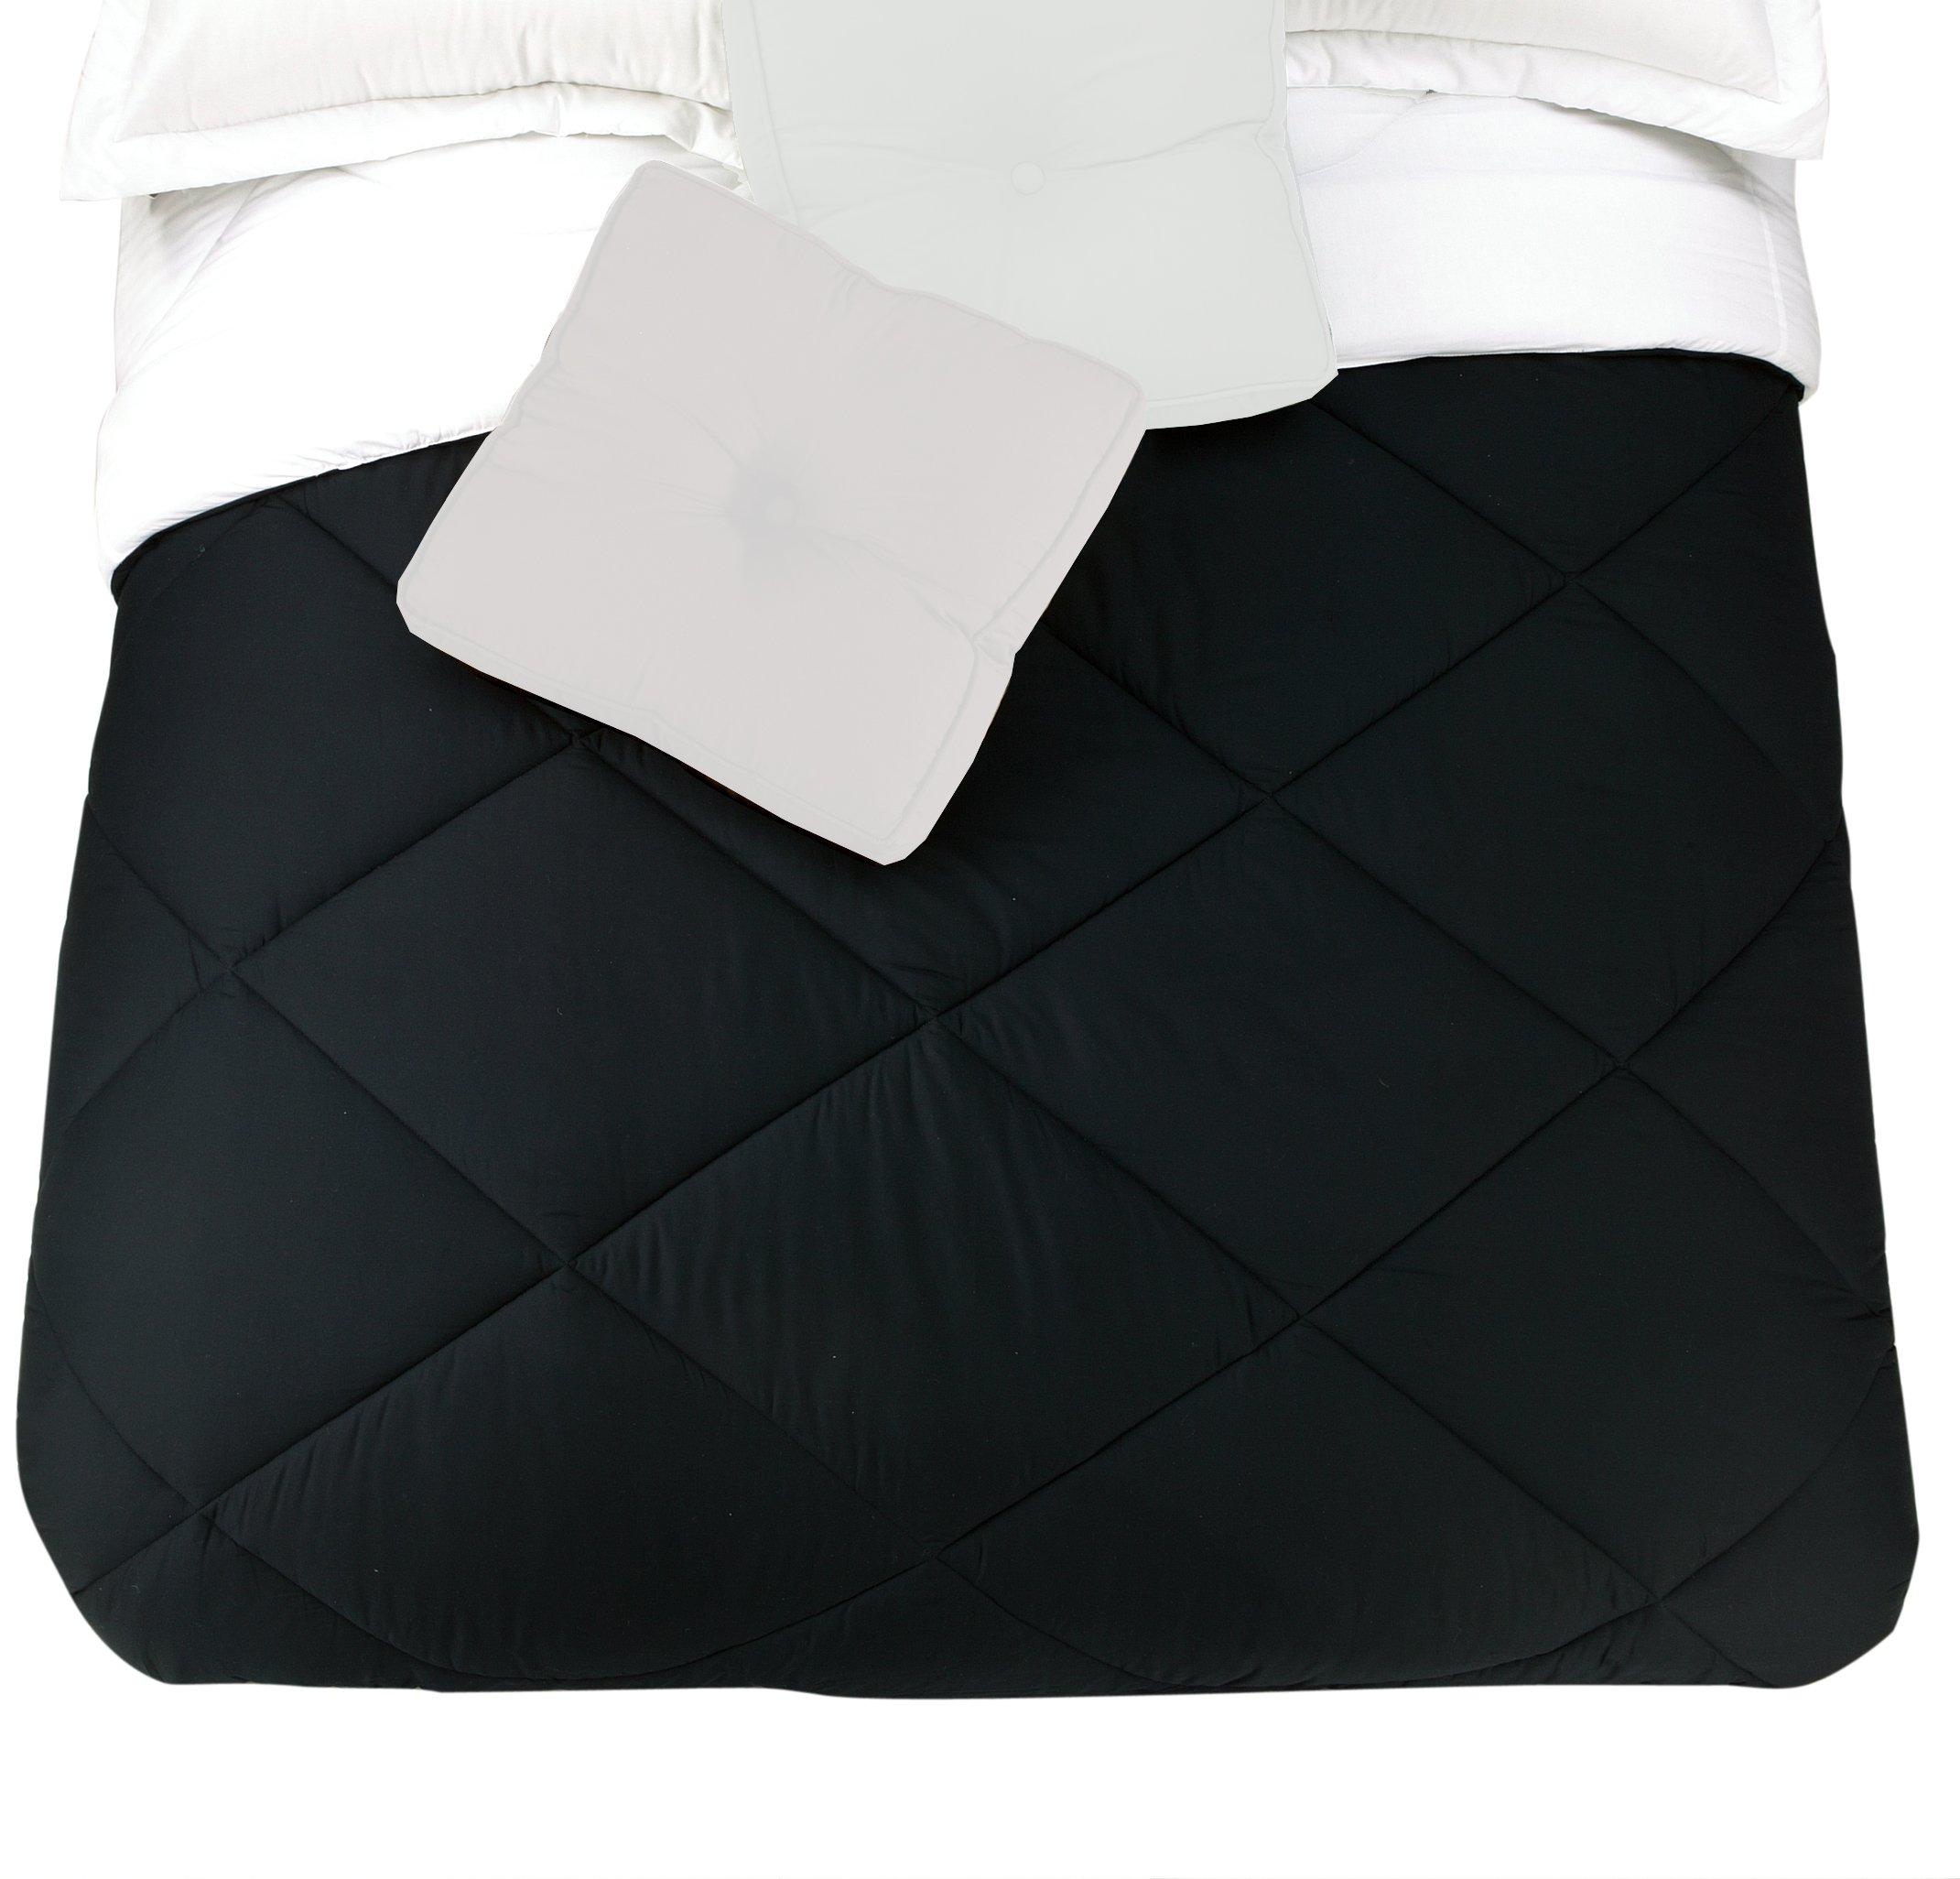 Presidio Square Collection Reversible Cotton Comforter, Queen, Black/White